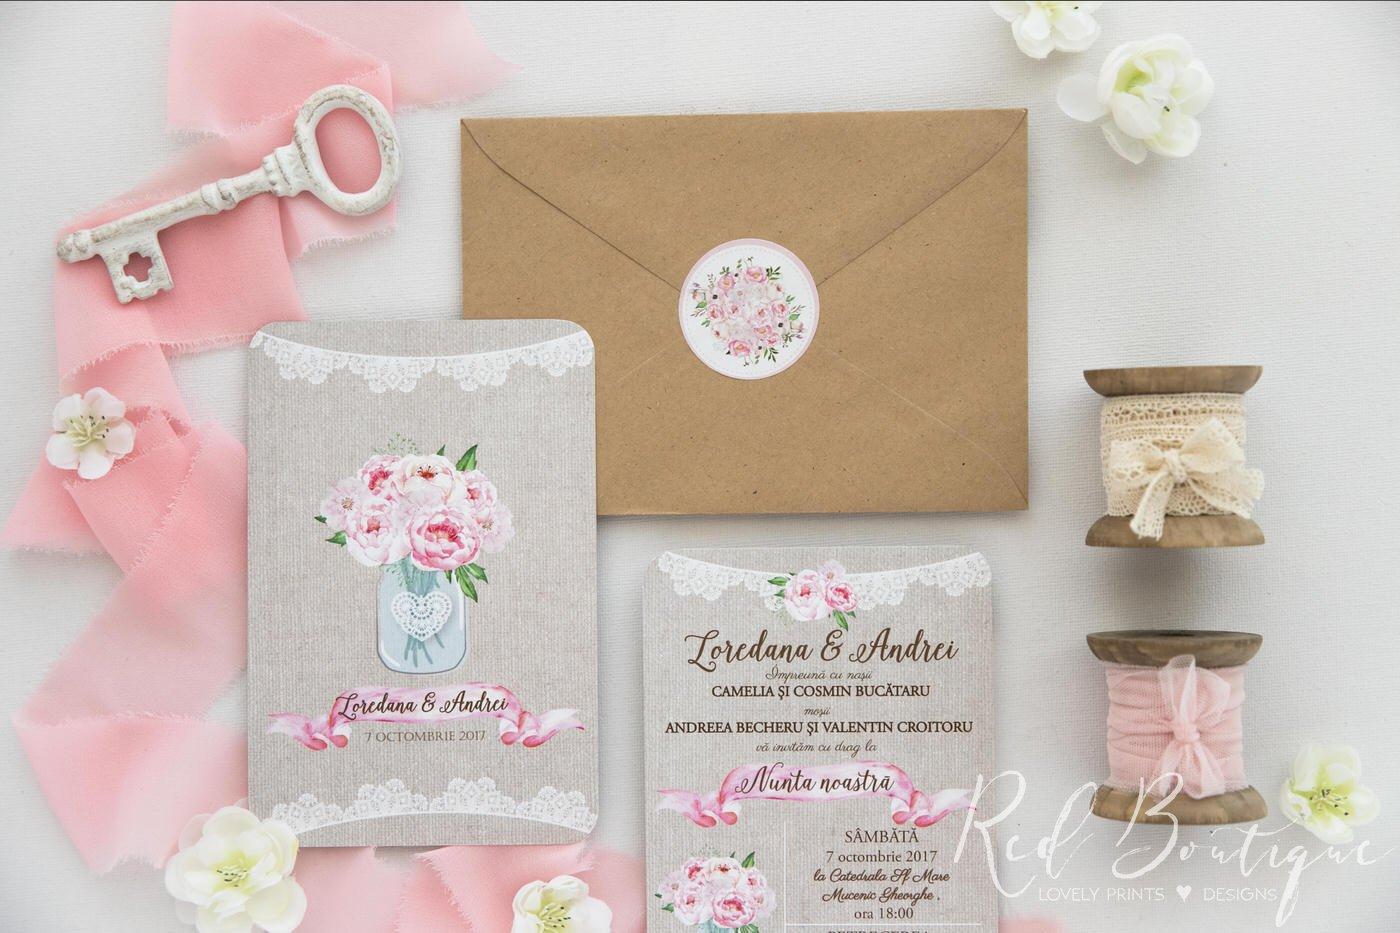 invitatie de nunta rustica cu buchet de bujori roz in borcan si plic kraft